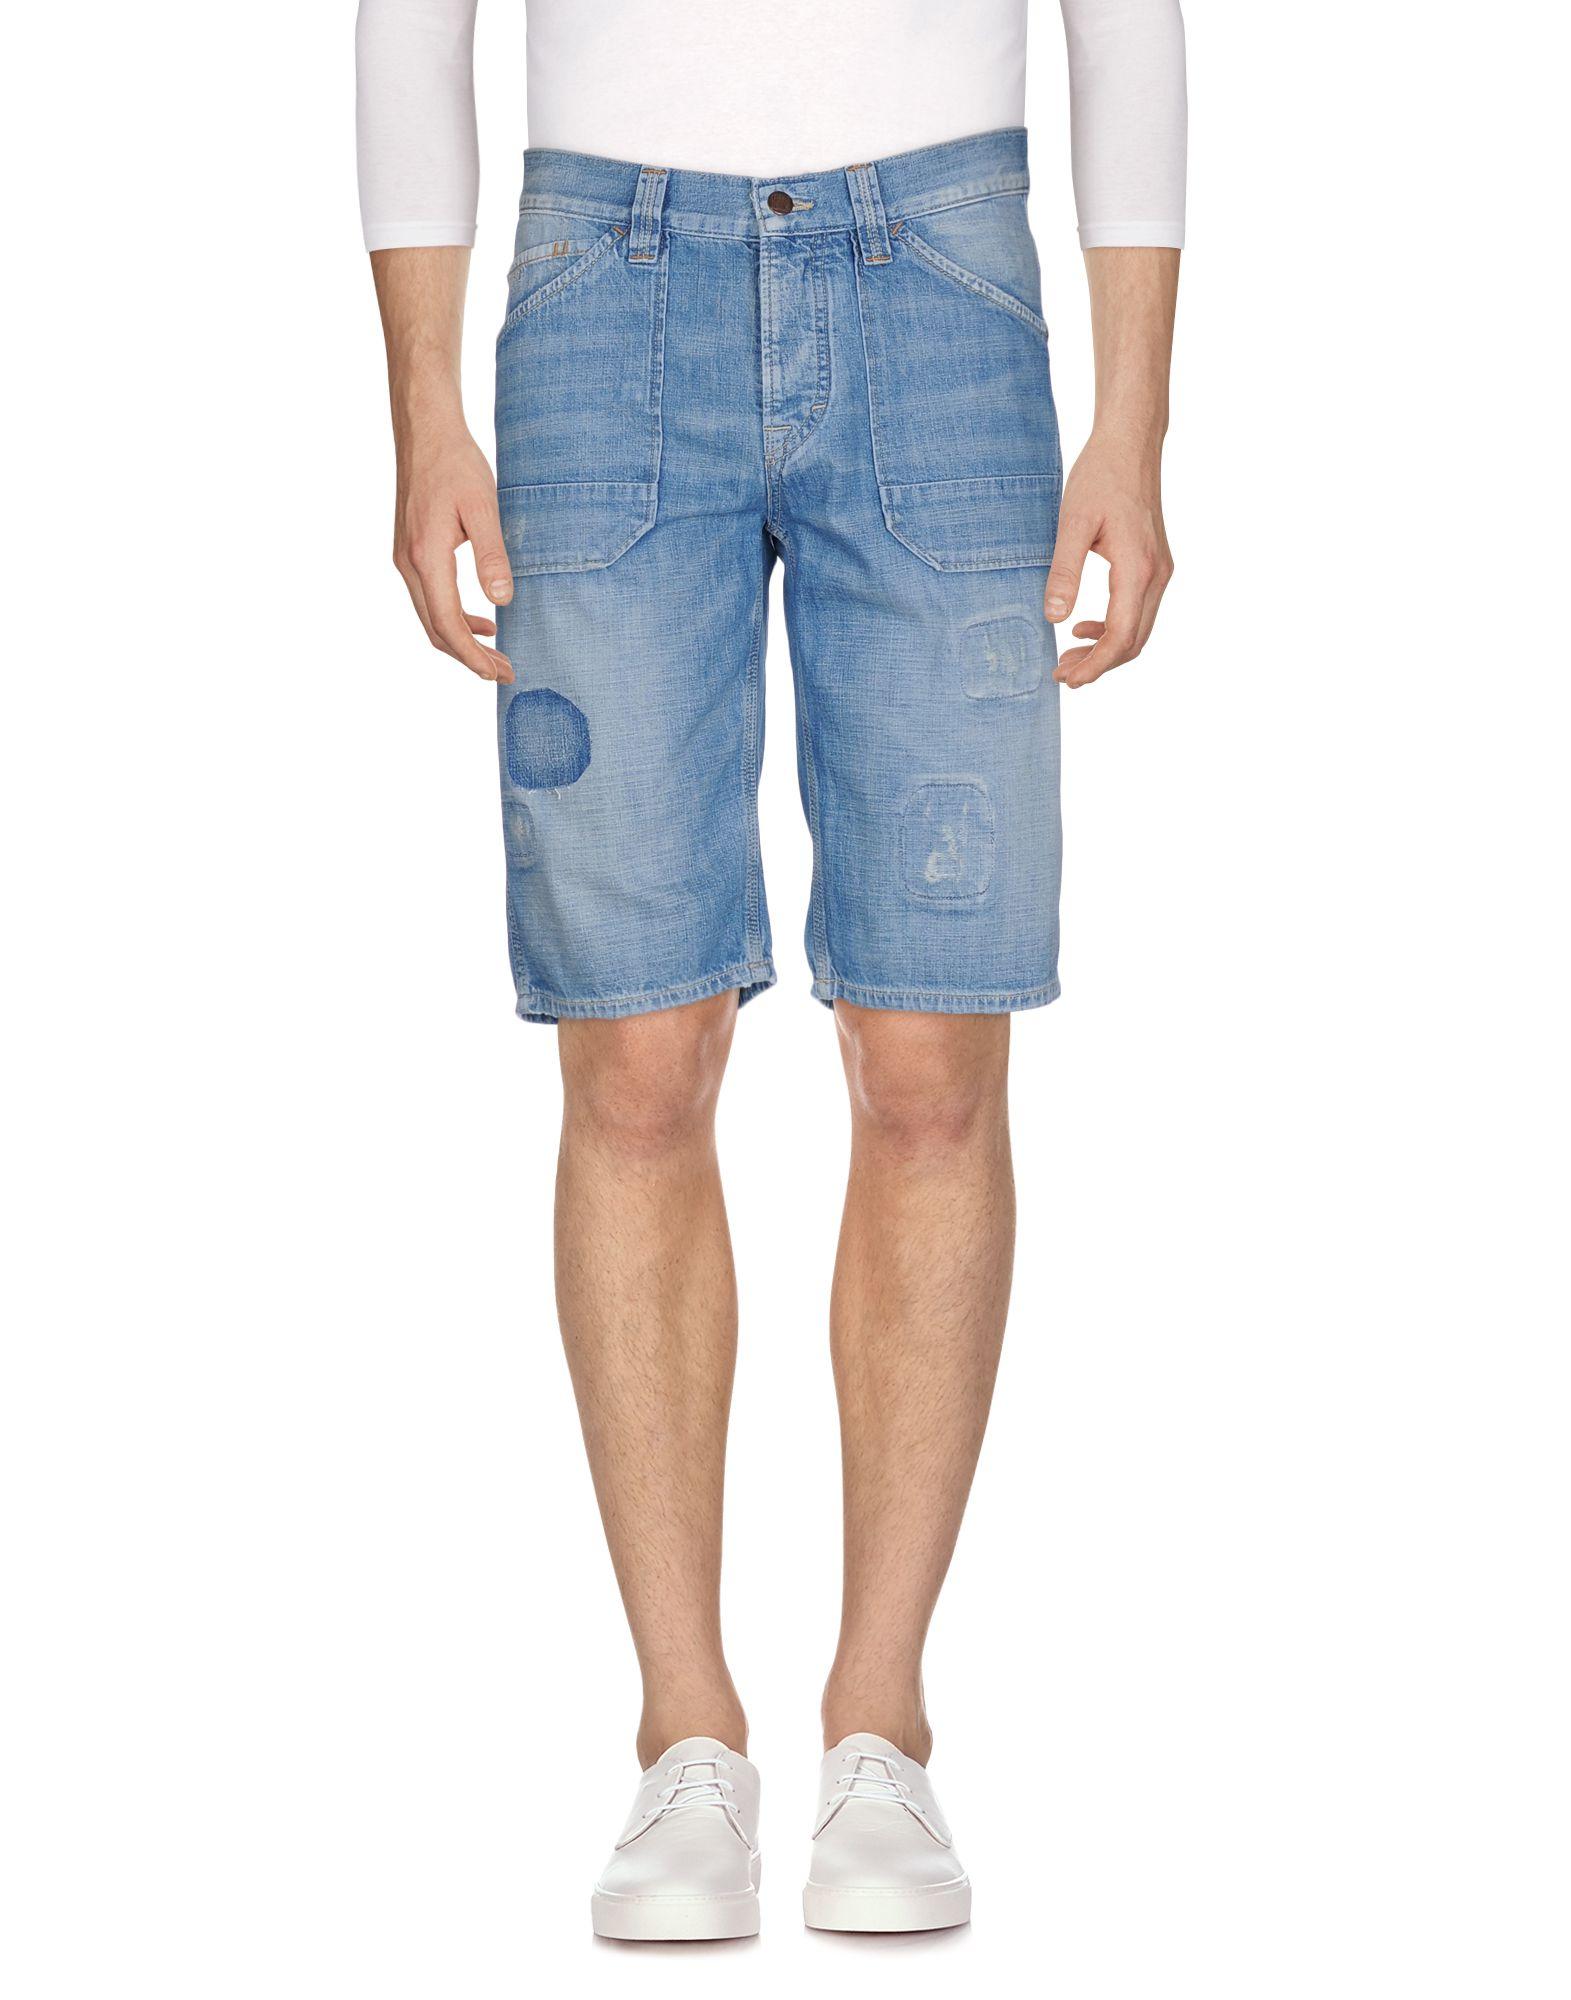 PEPE JEANS Джинсовые бермуды бермуды pepe jeans london бермуды